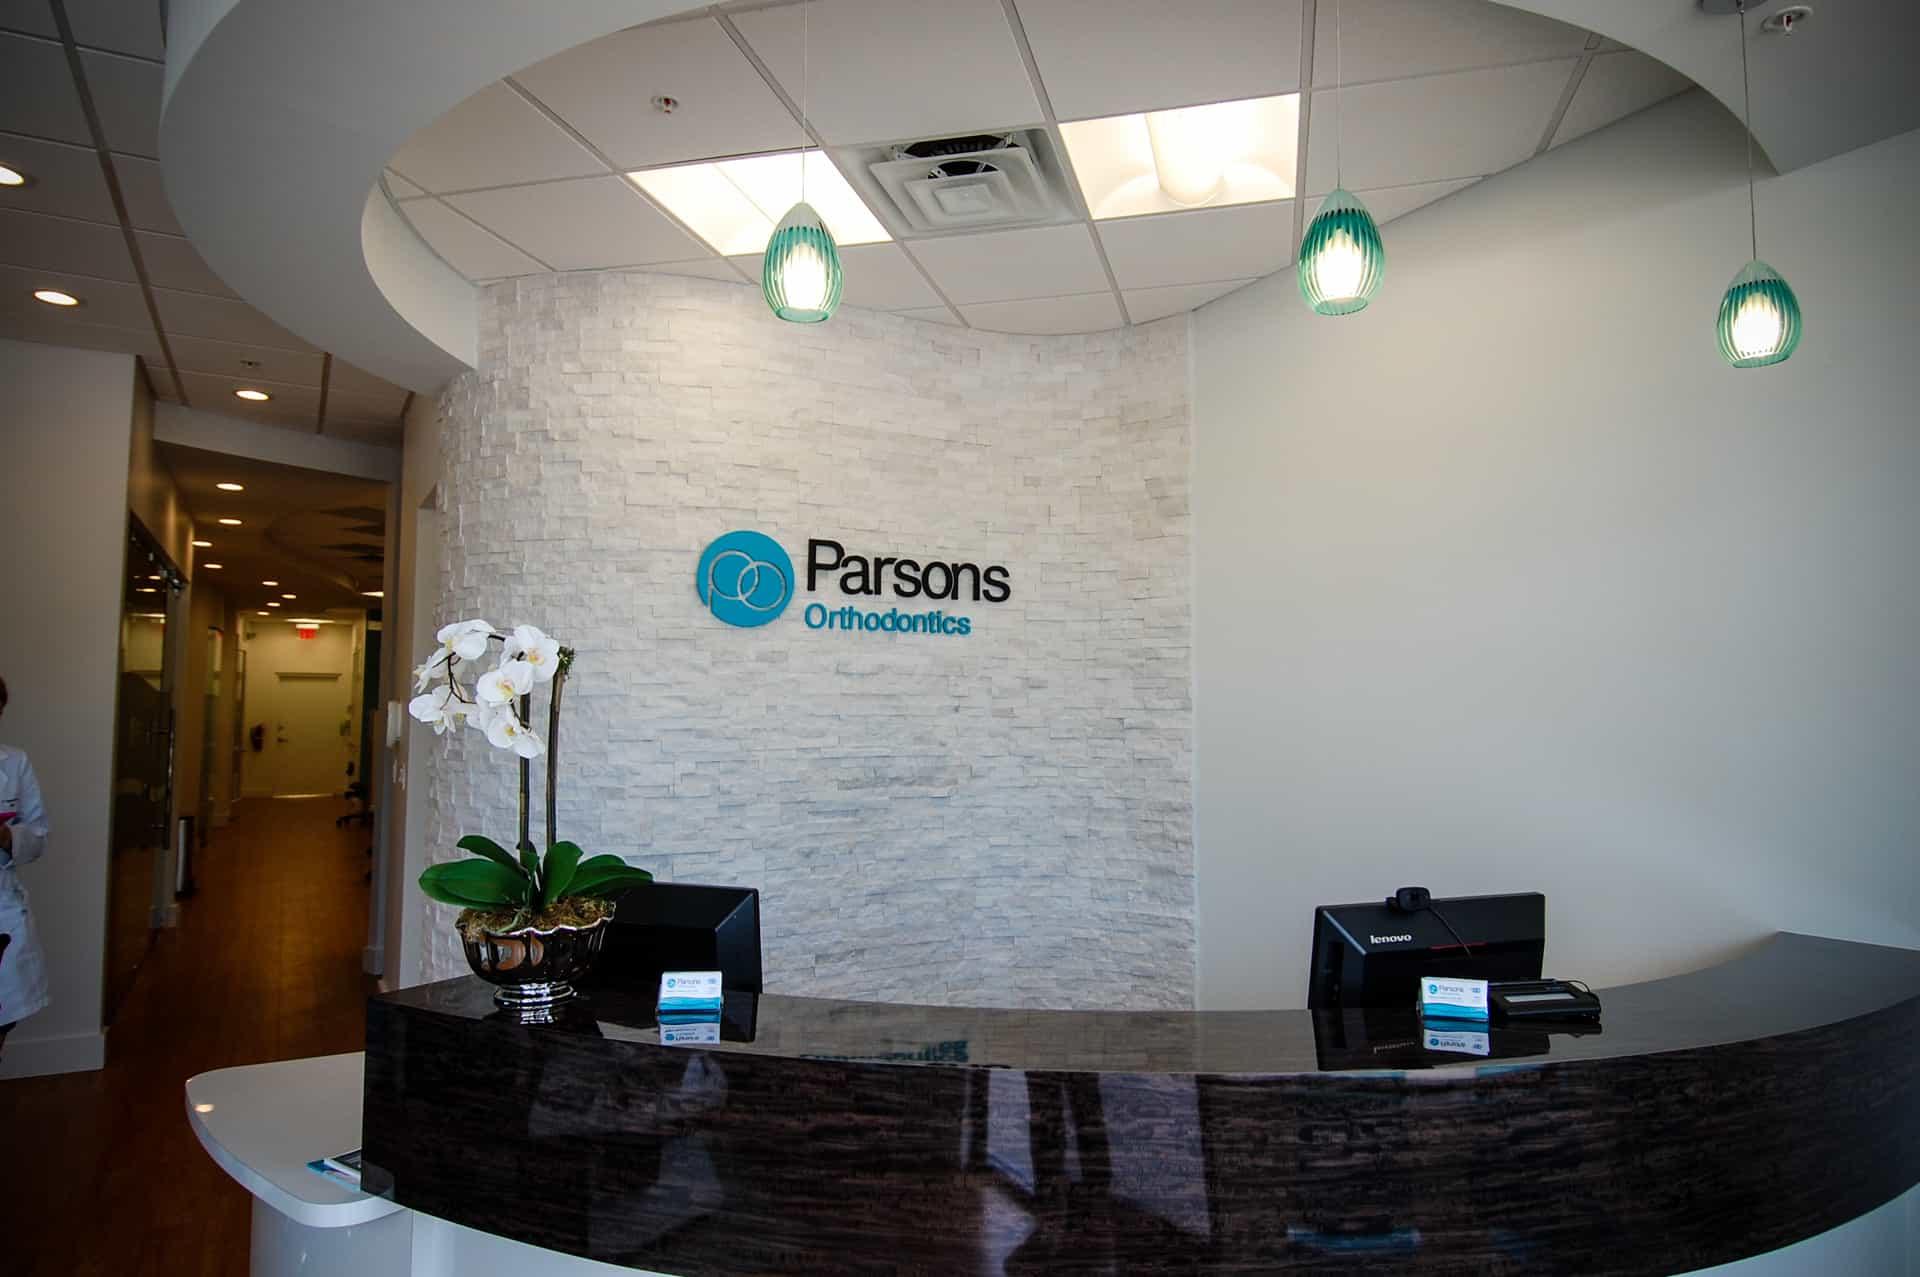 TrebArc: Dr. Parsons Orthodontics